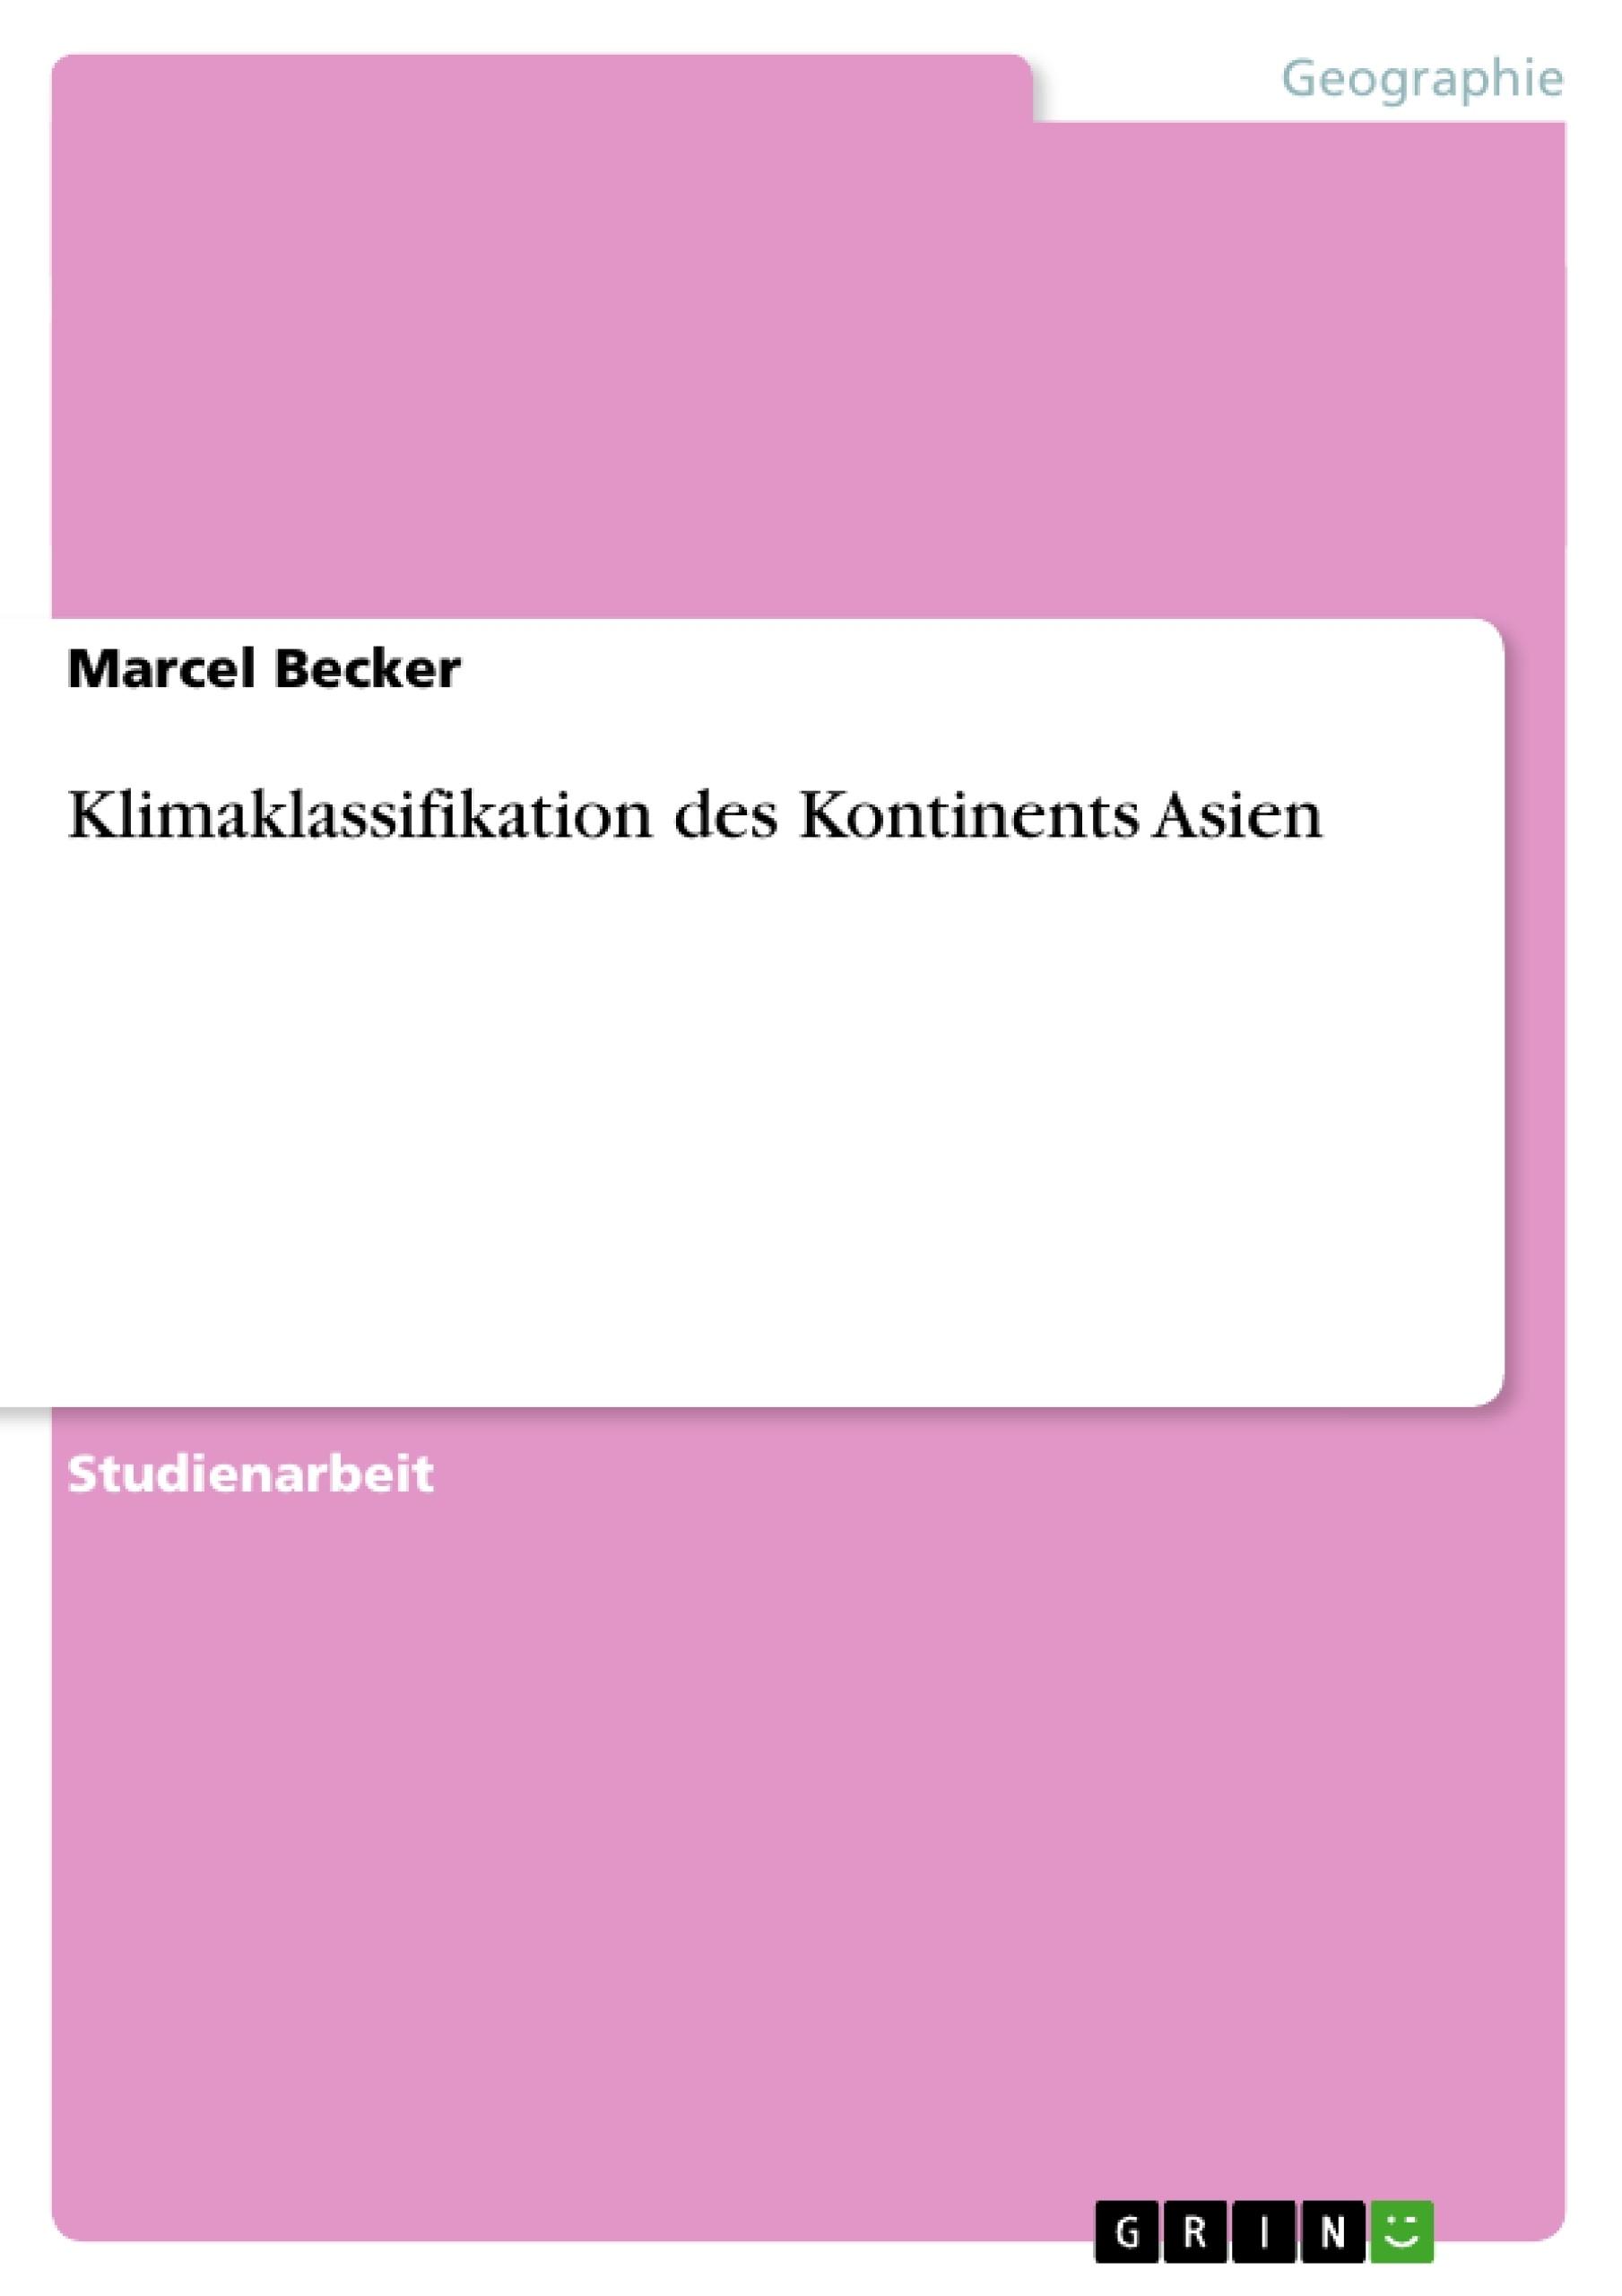 Titel: Klimaklassifikation des Kontinents Asien